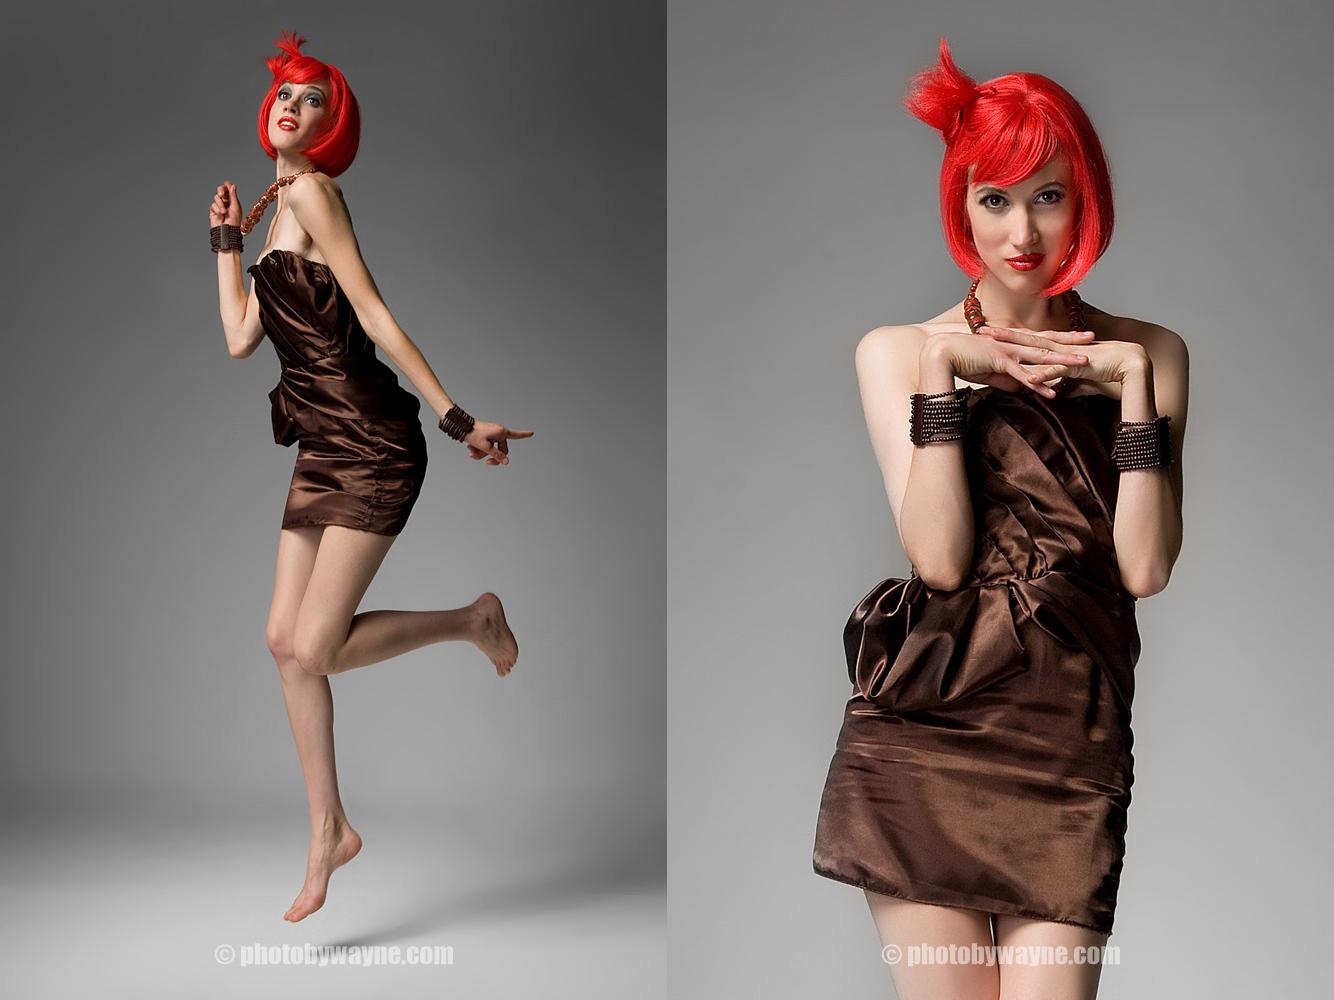 toronto-clothing-catalog-photographer.jpg